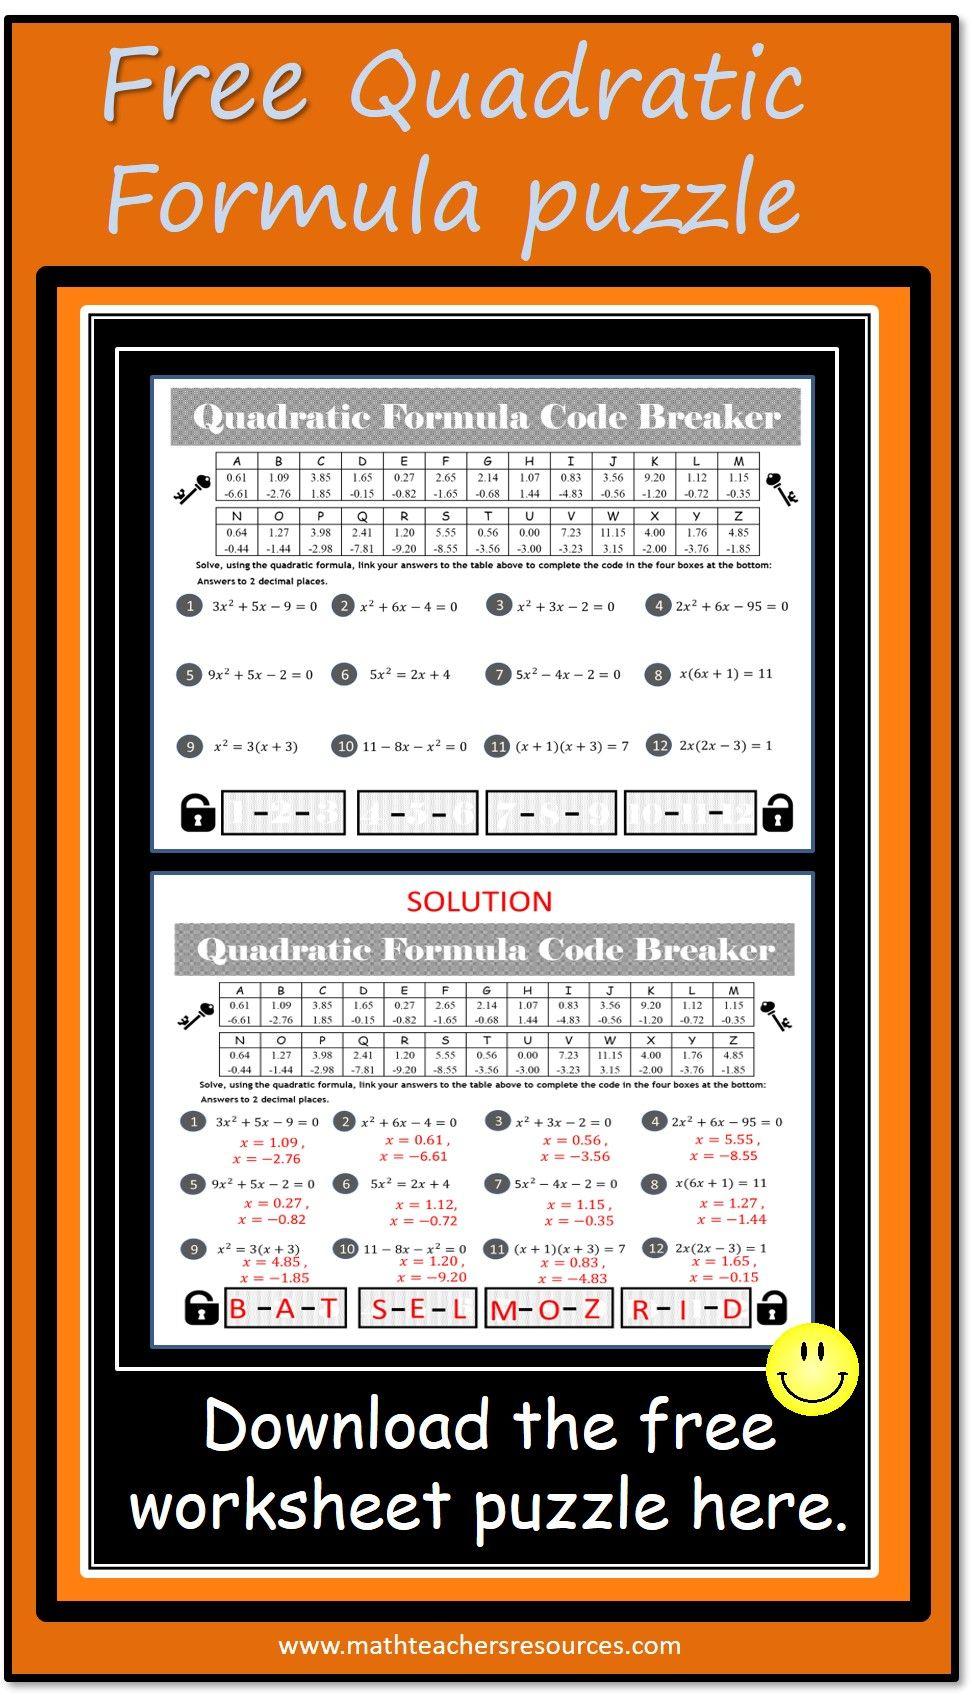 Quadratic Formula Worksheet Puzzle Free Quadratics Quadratic Formula Solving Quadratics [ 1695 x 972 Pixel ]